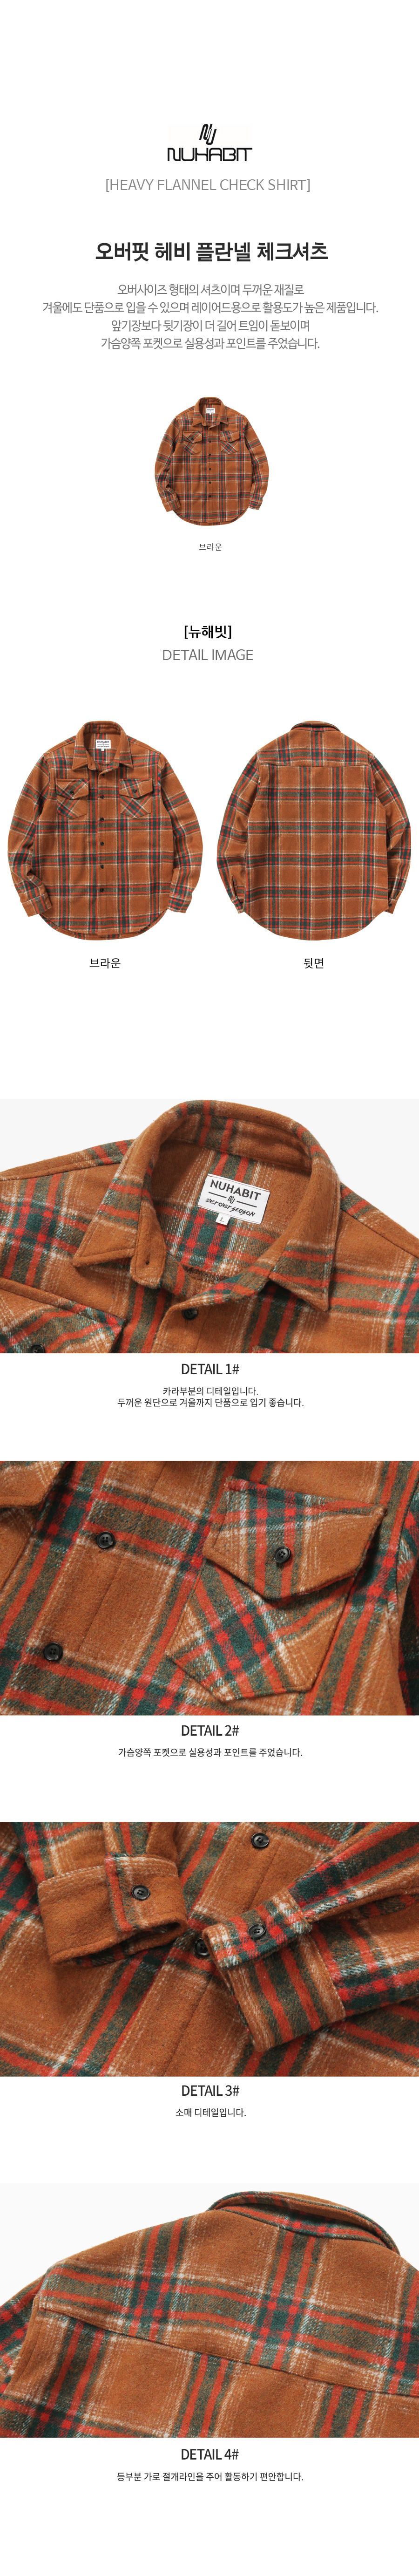 flannel_shirts_brown.jpg